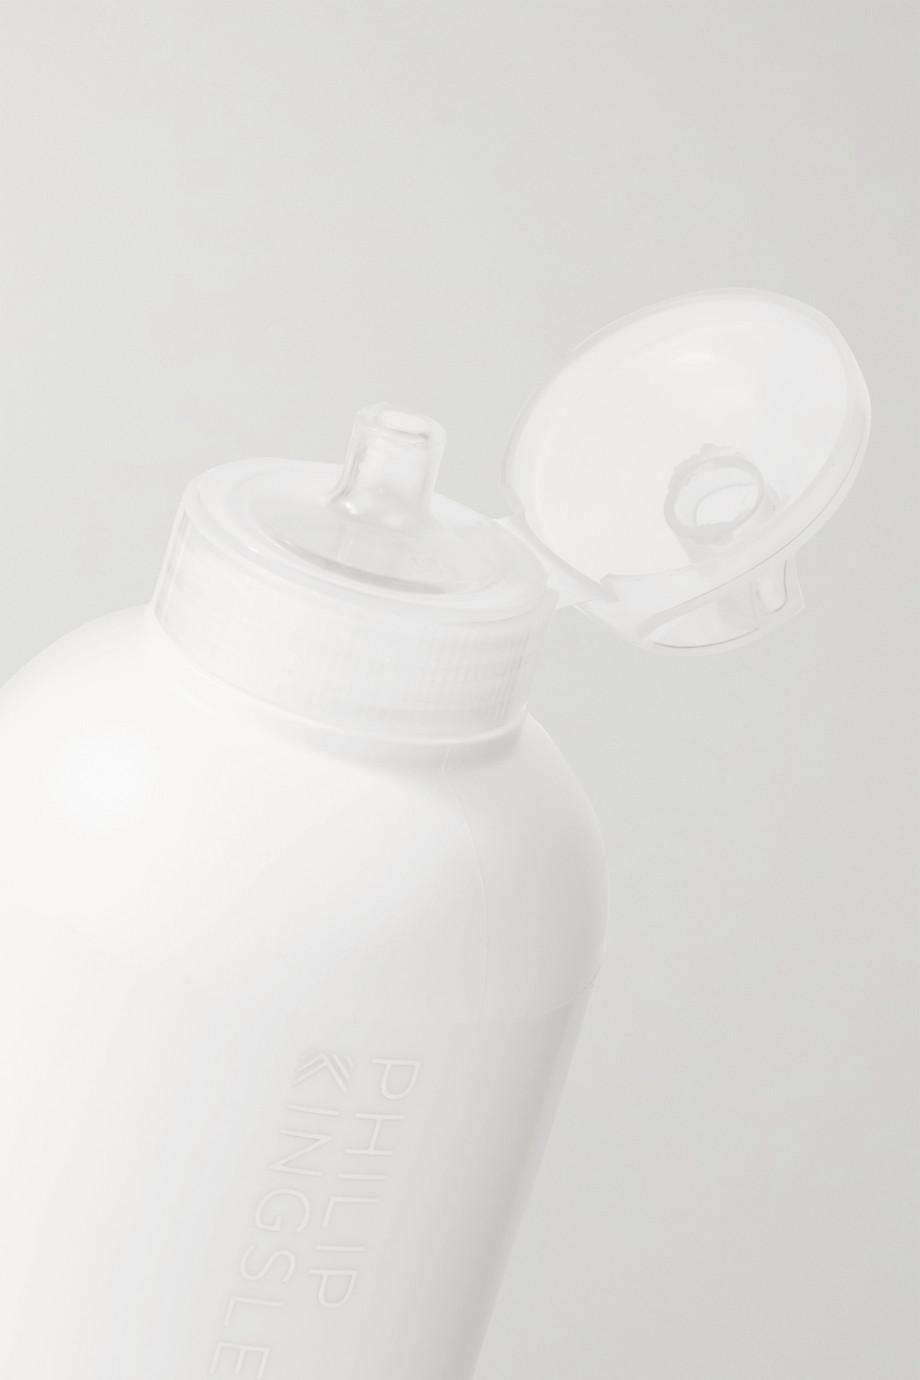 PHILIP KINGSLEY Flaky Scalp Cleansing Shampoo, 250ml